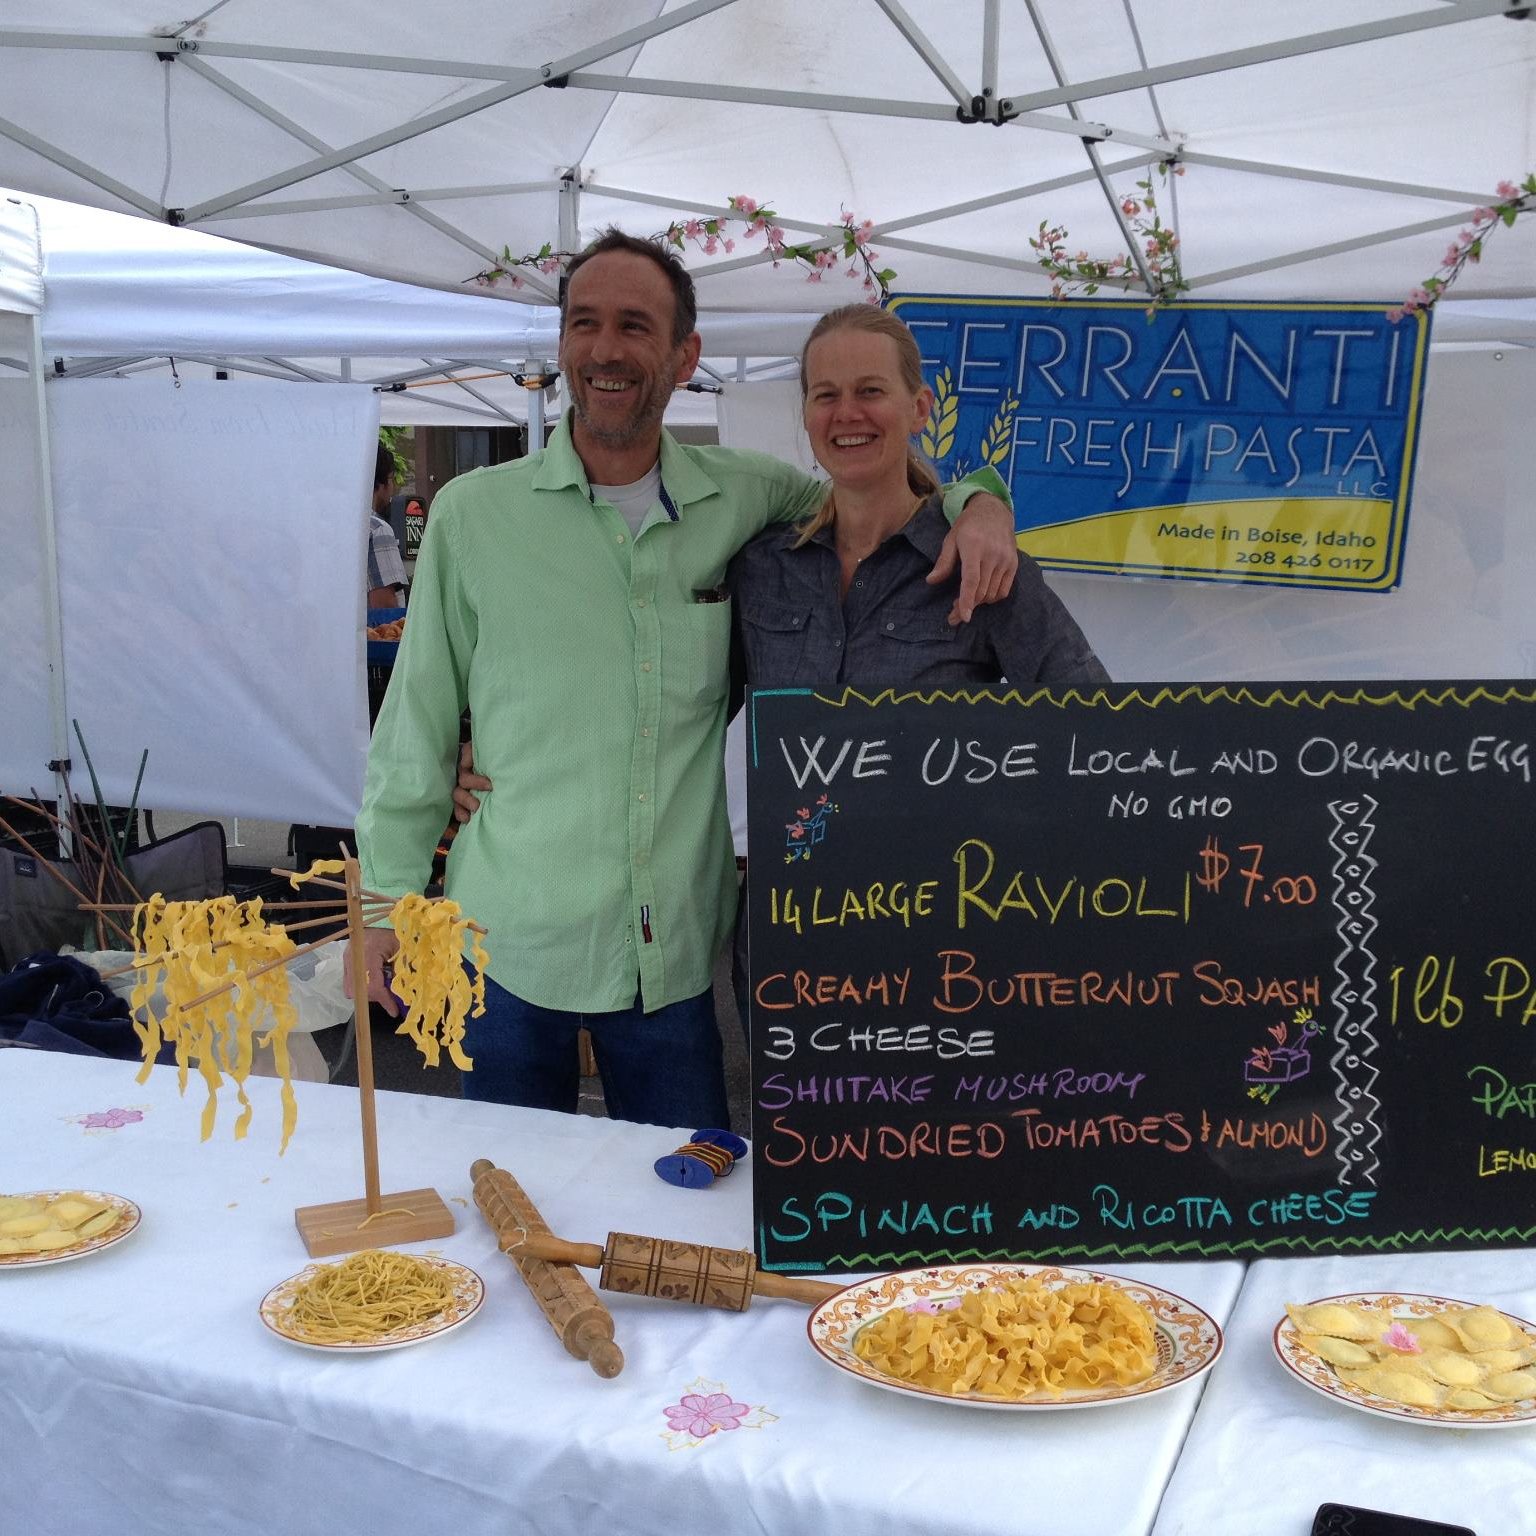 Ferranti Fresh Pasta